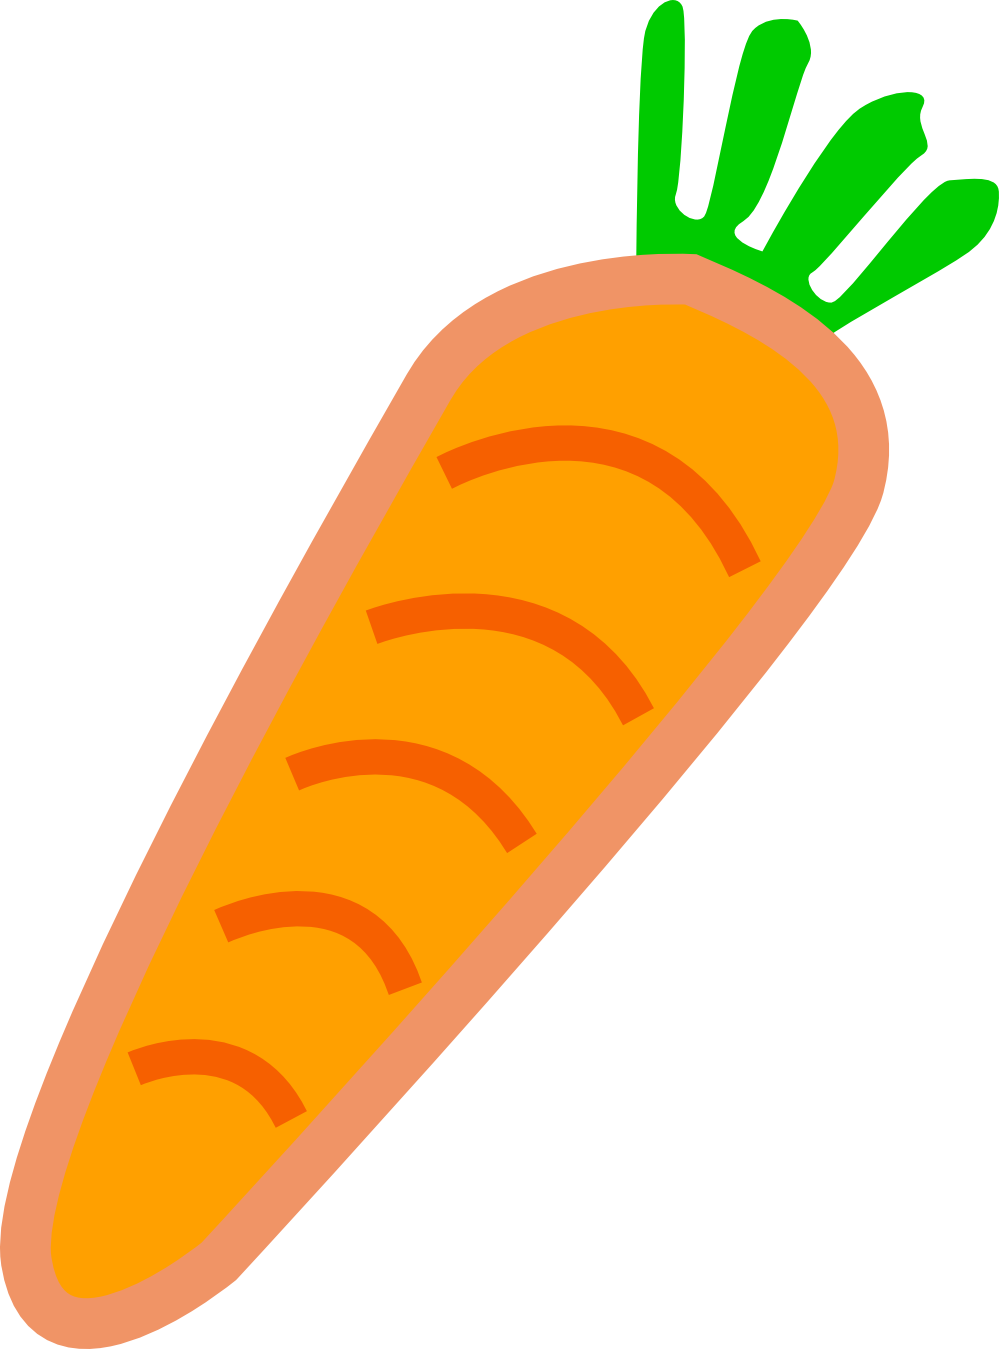 Clip Art: Carrot Redonkulous clipartist.net Art ... - ClipArt Best ...